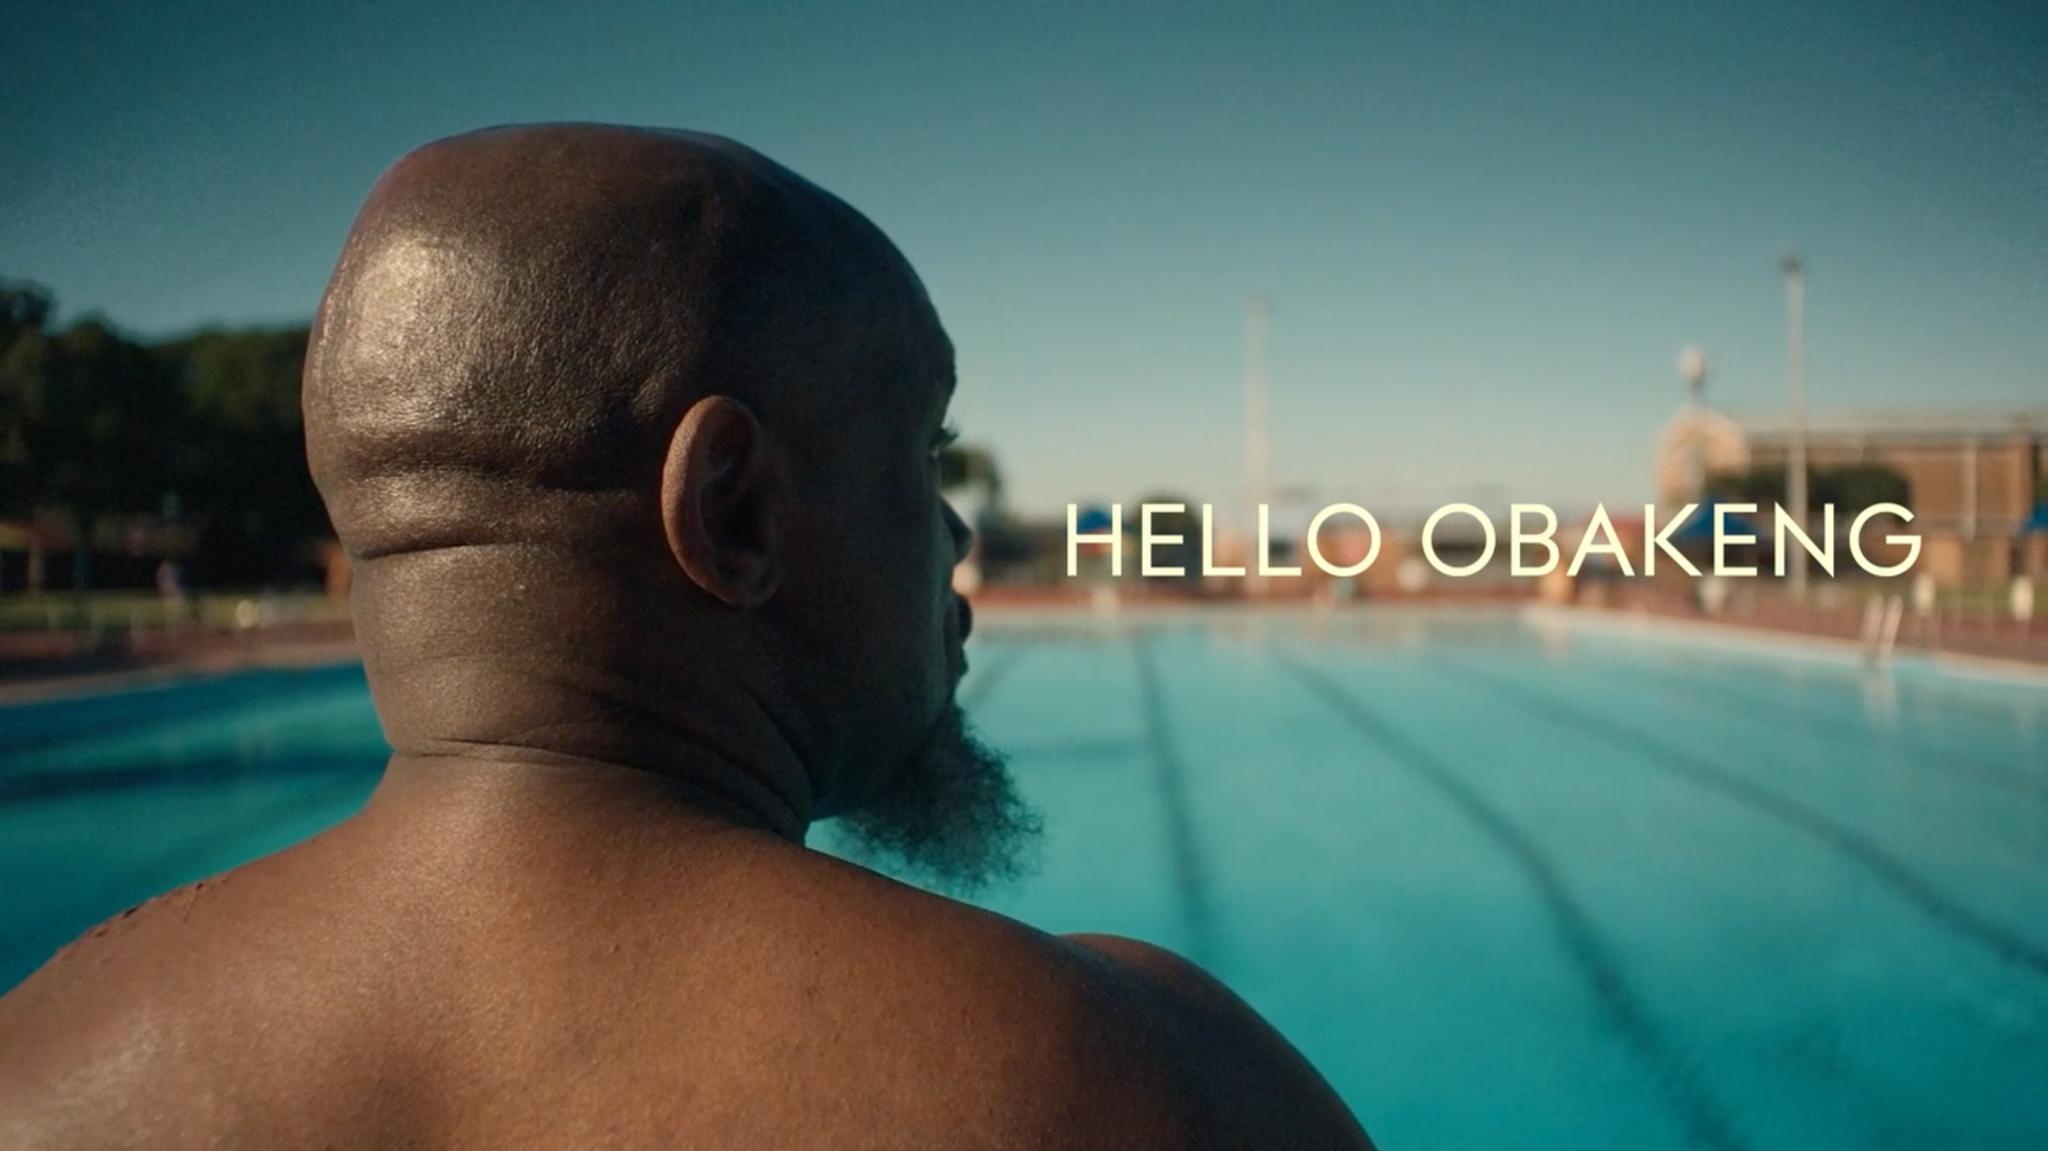 Hello Obakeng,